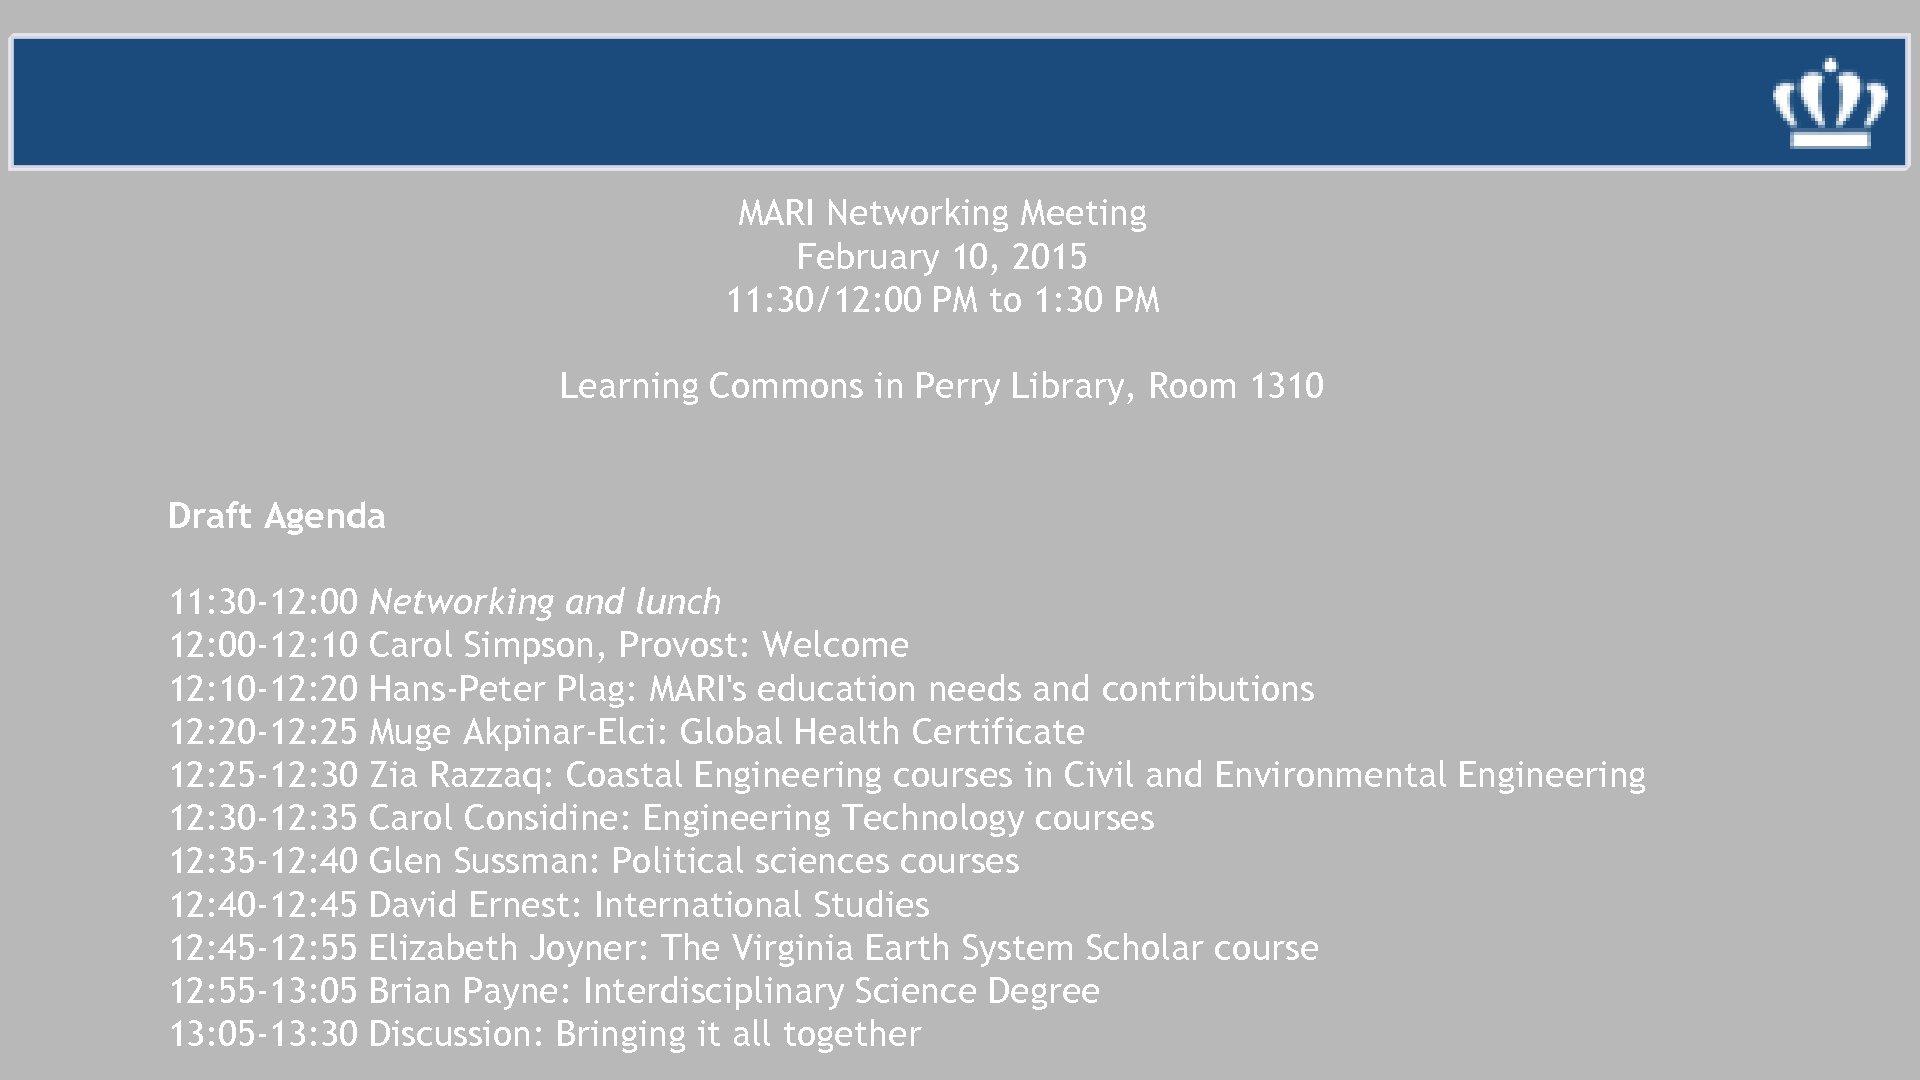 MARI Networking Meeting February 10, 2015 11: 30/12: 00 PM to 1: 30 PM